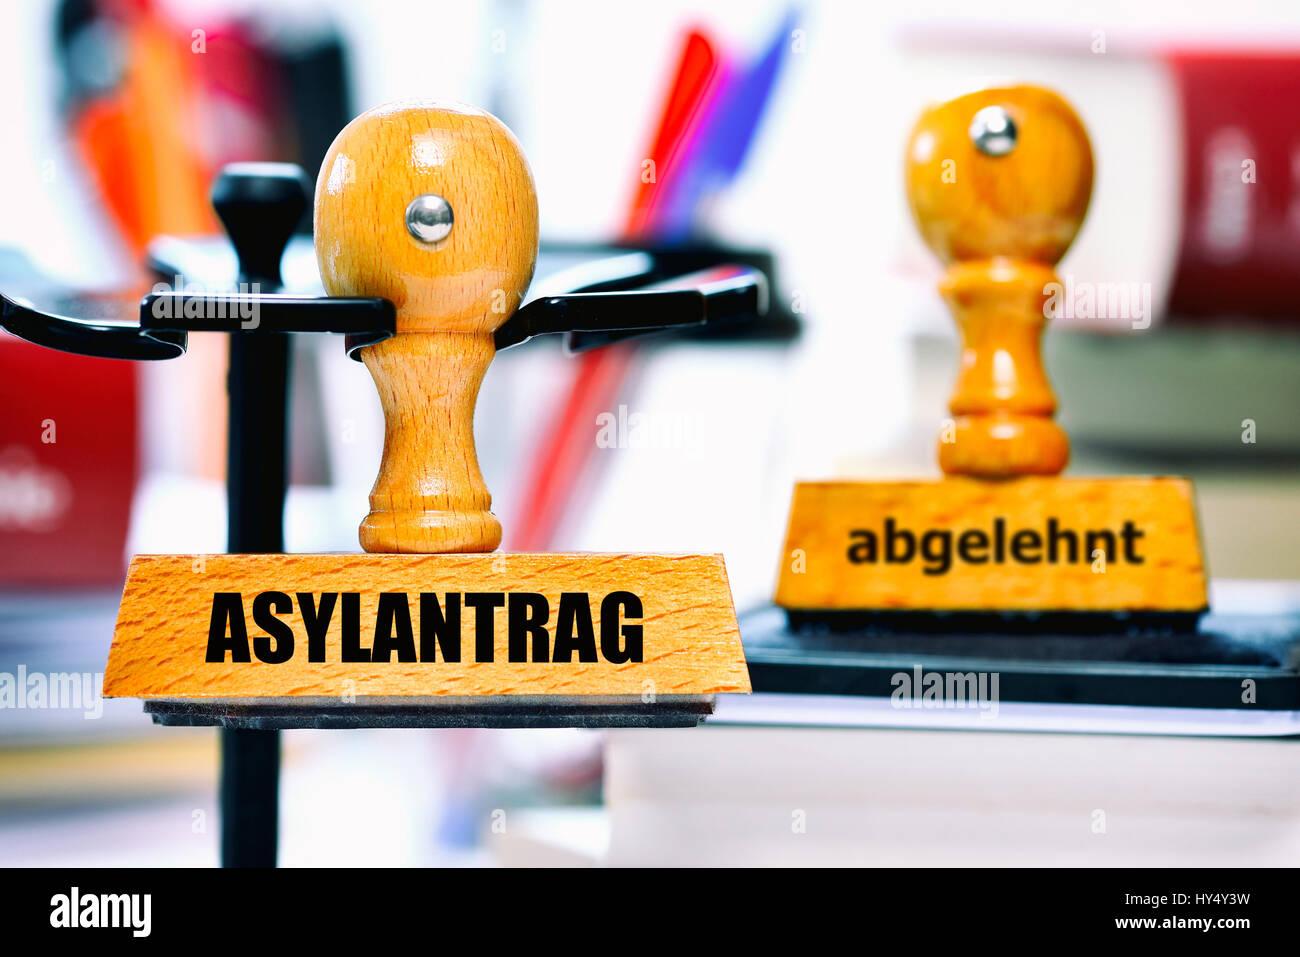 Stamp with the label Asylum application and rejected, Stempel mit der Aufschrift Asylantrag und abgelehnt Stock Photo